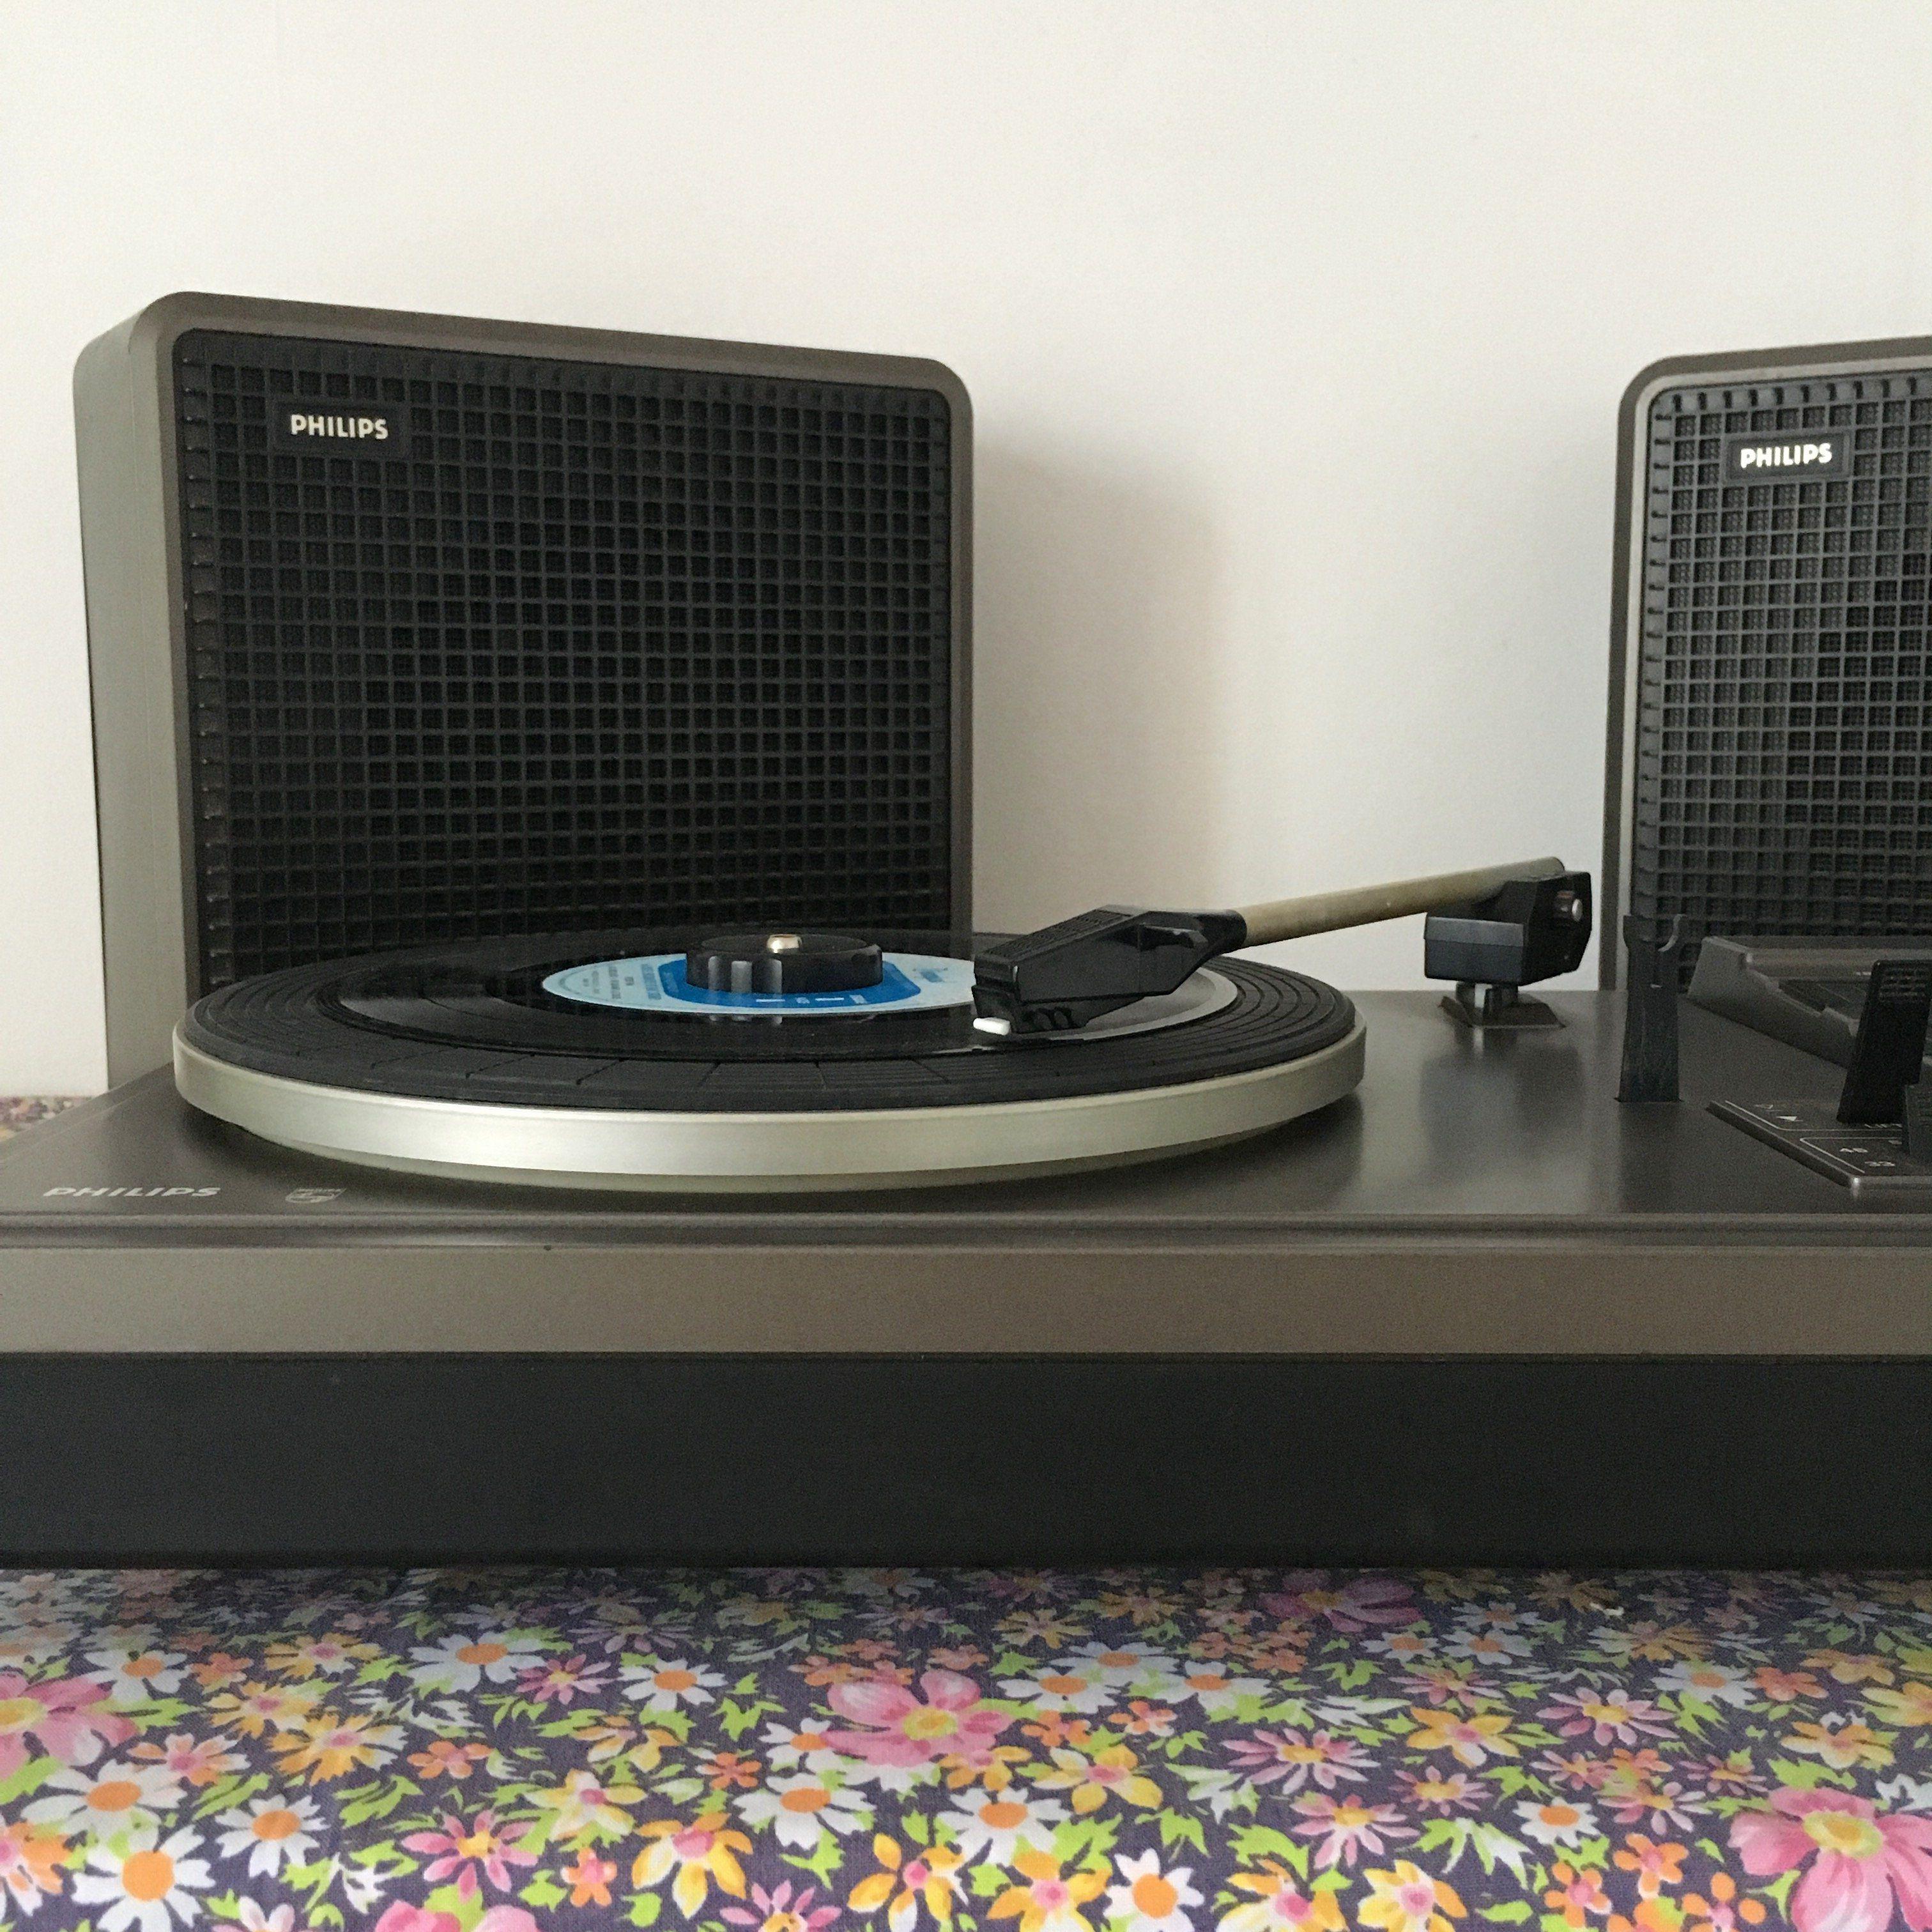 orangevertevintage platine tourne disque vintage philips 381 autour de mon enfance platine. Black Bedroom Furniture Sets. Home Design Ideas